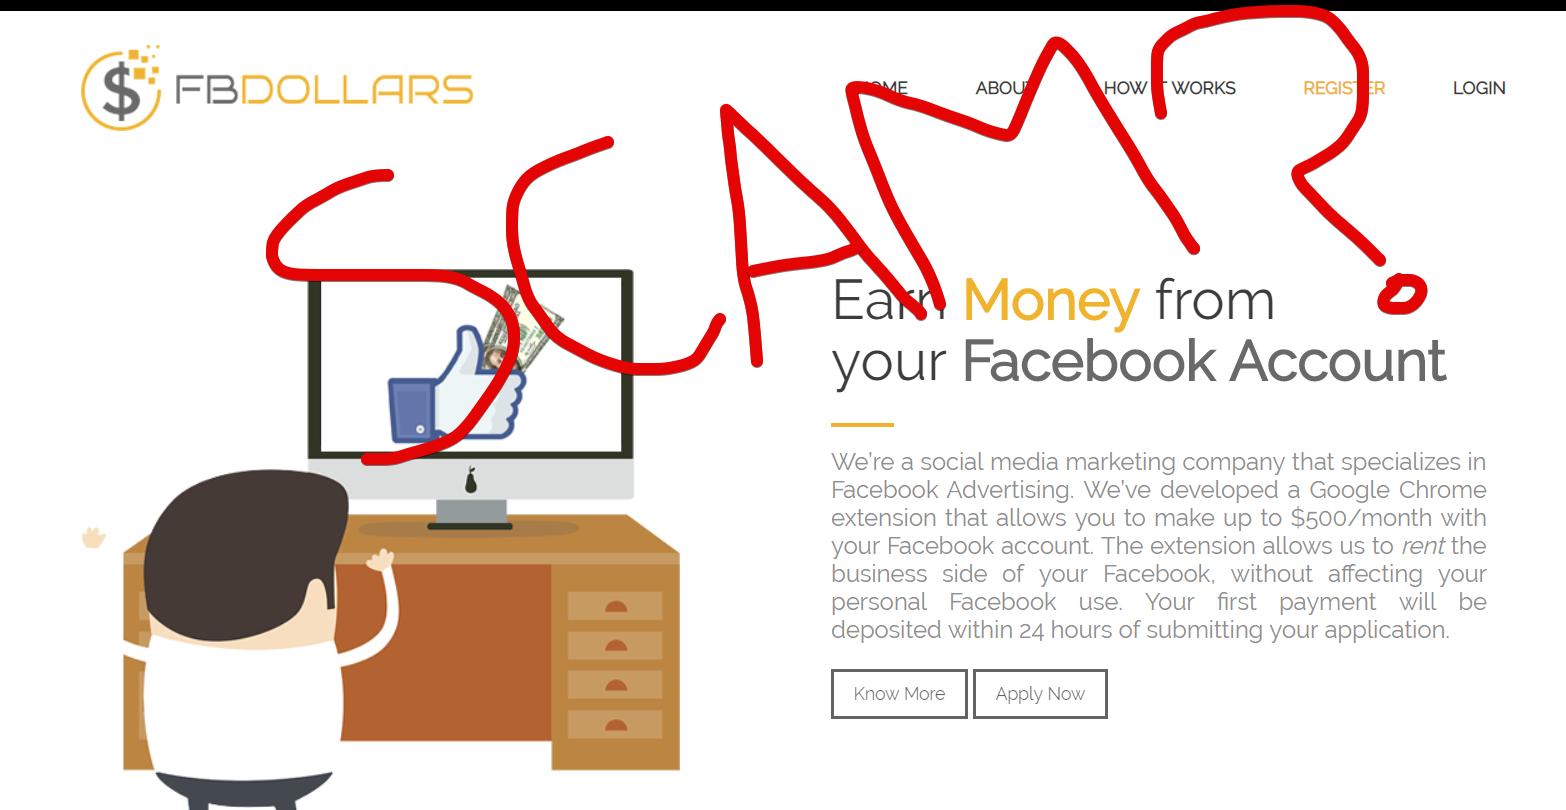 FB Dollars